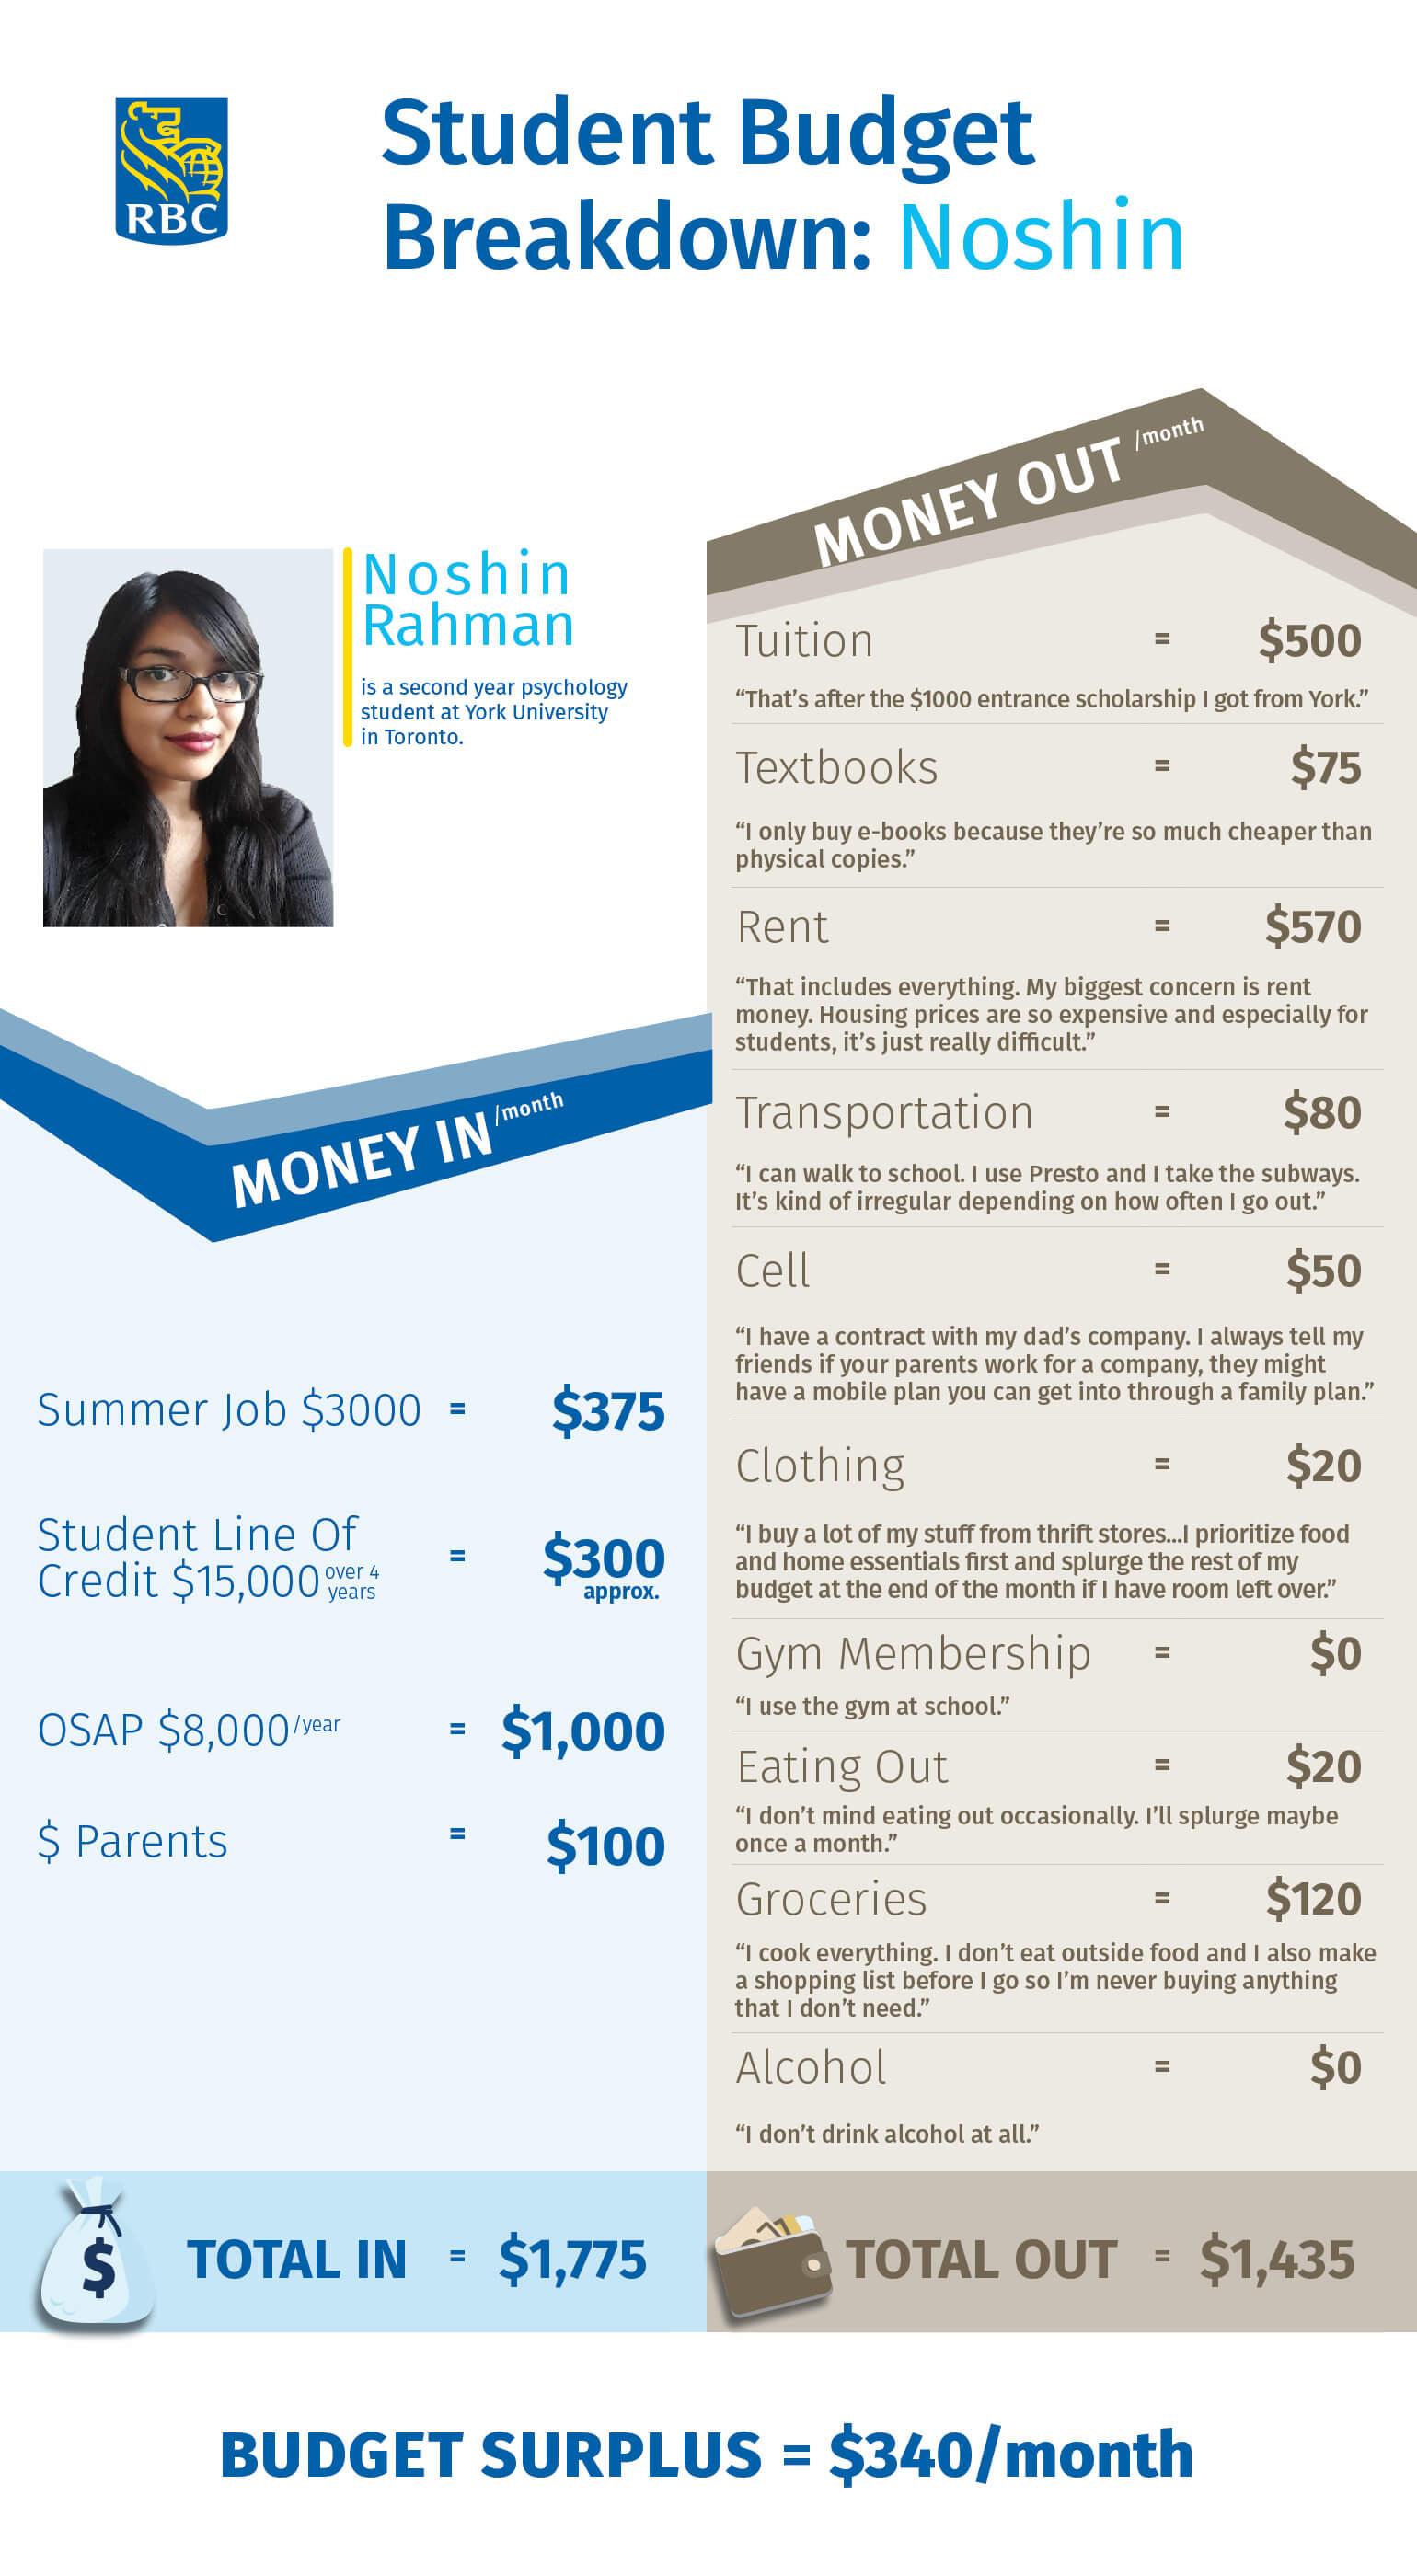 student budget breakdown noshin